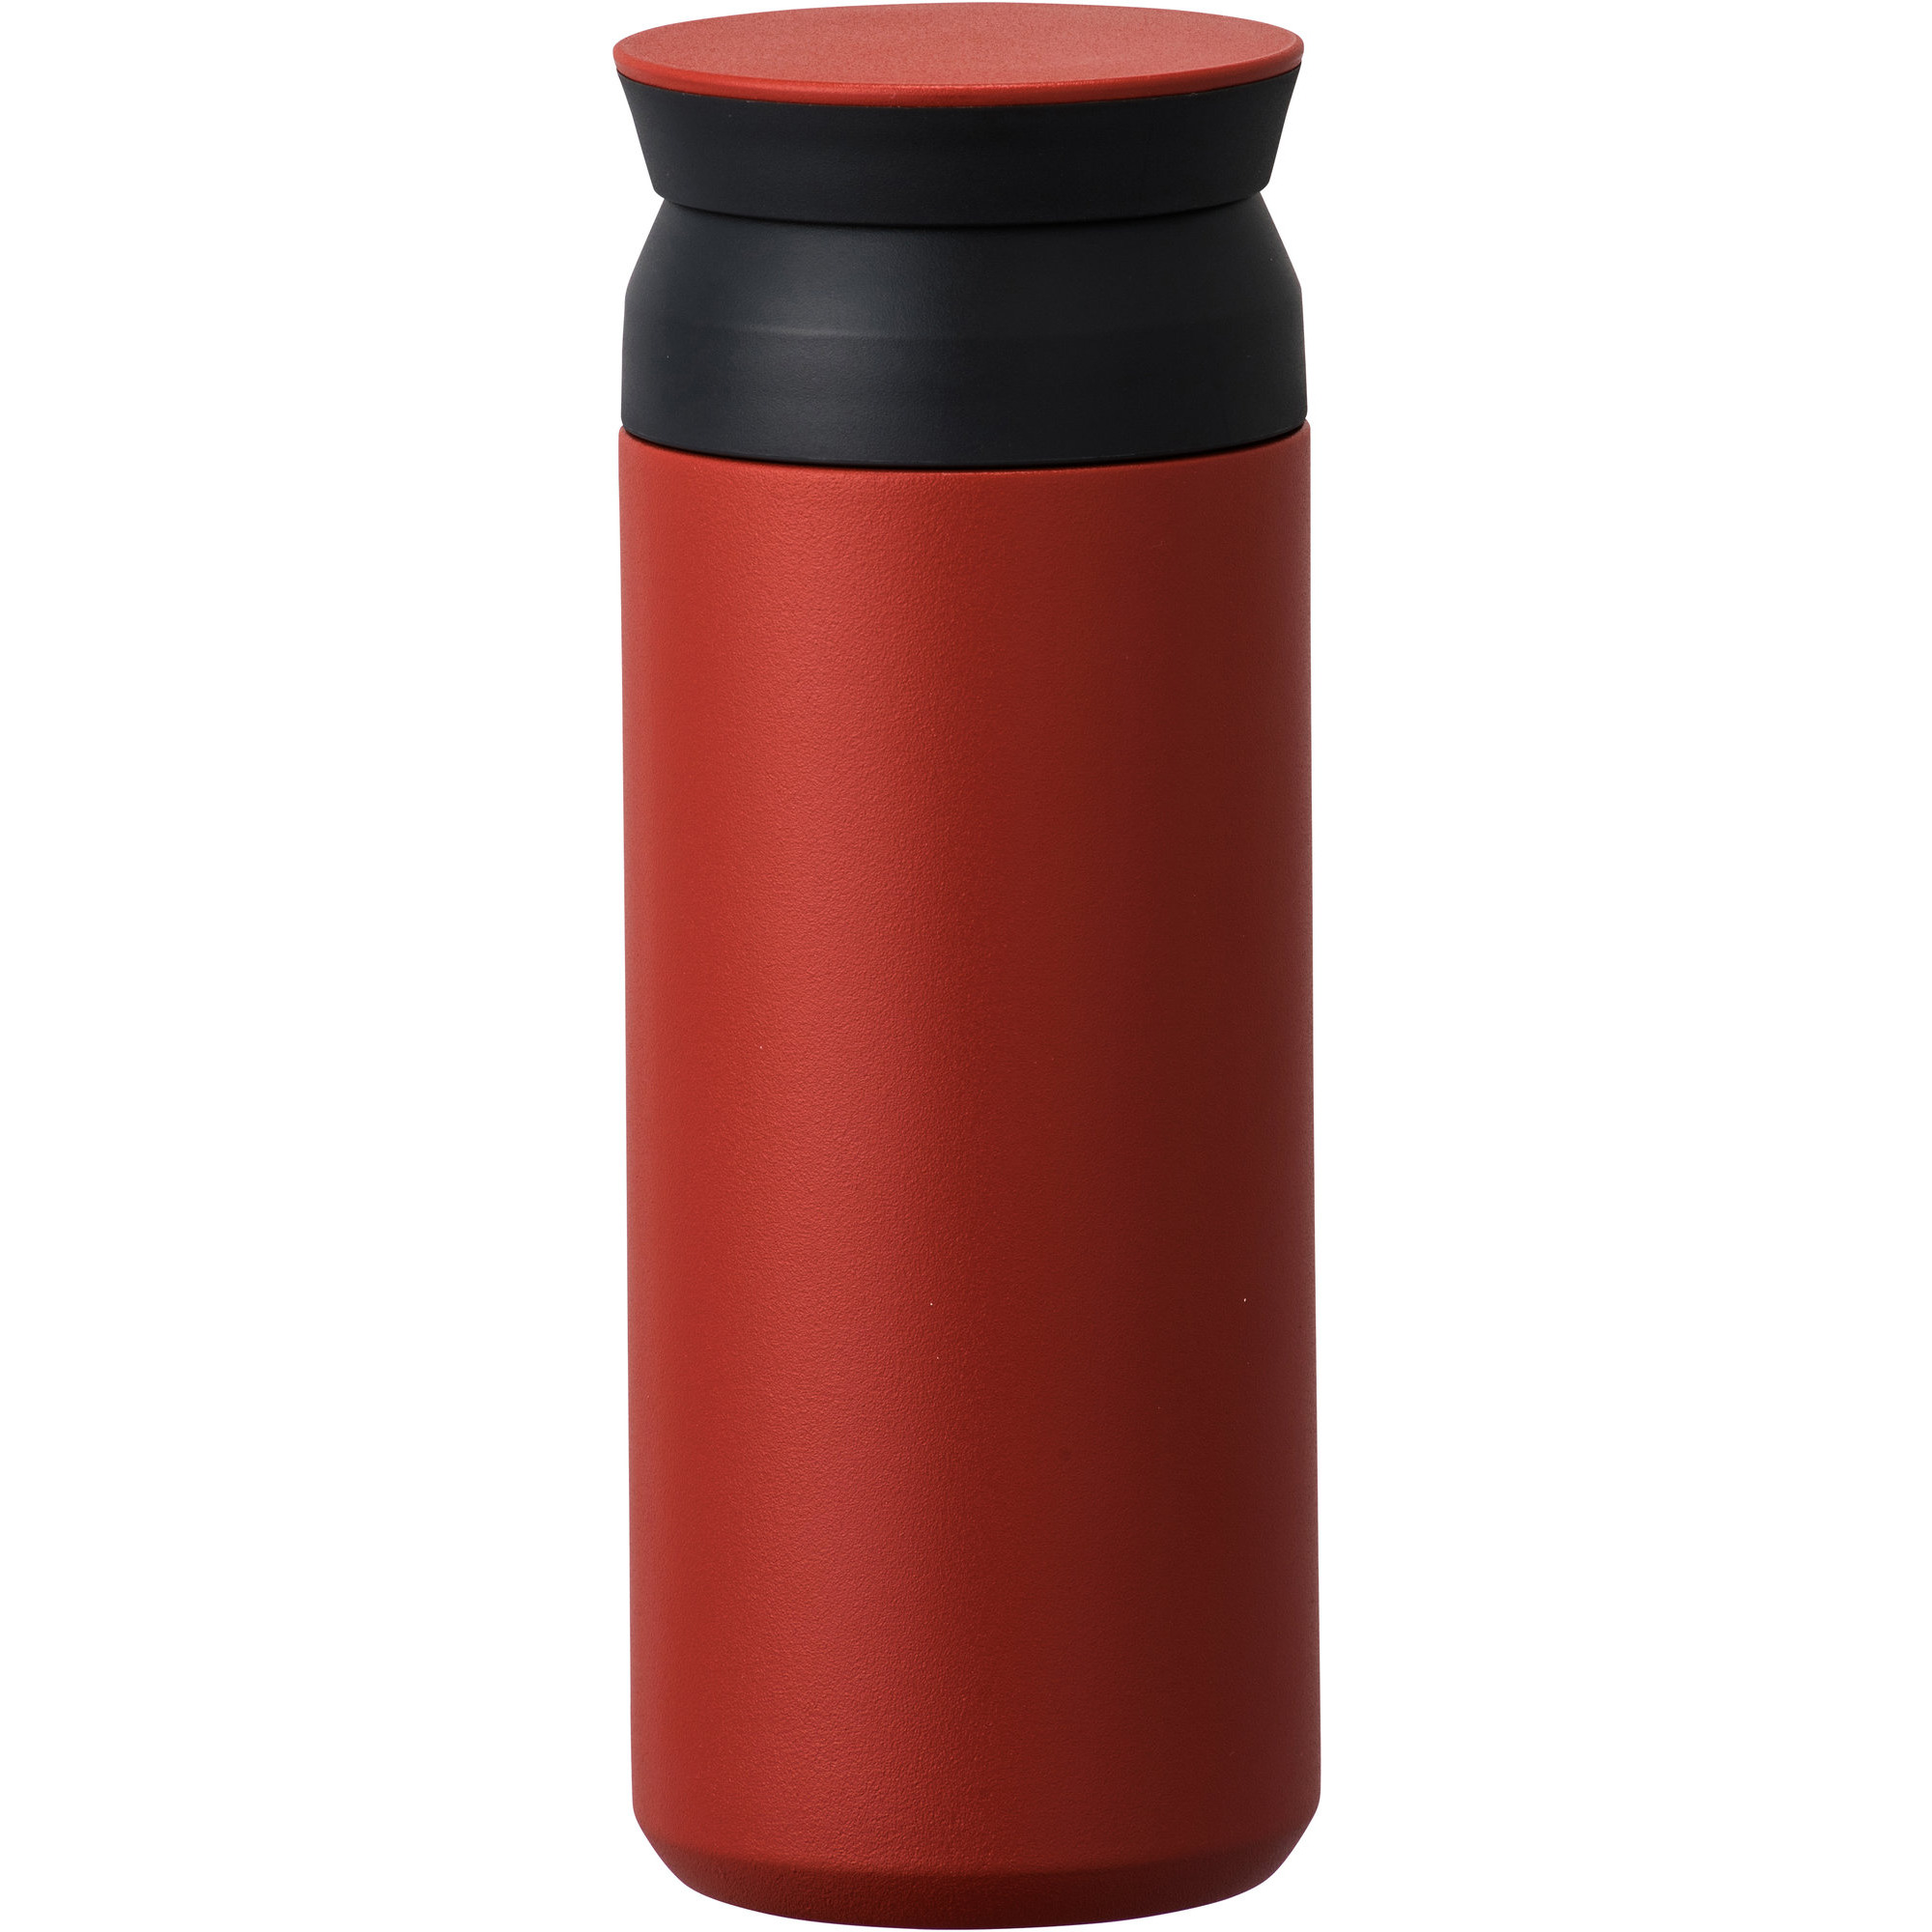 Kinto Termomugg 500 ml röd